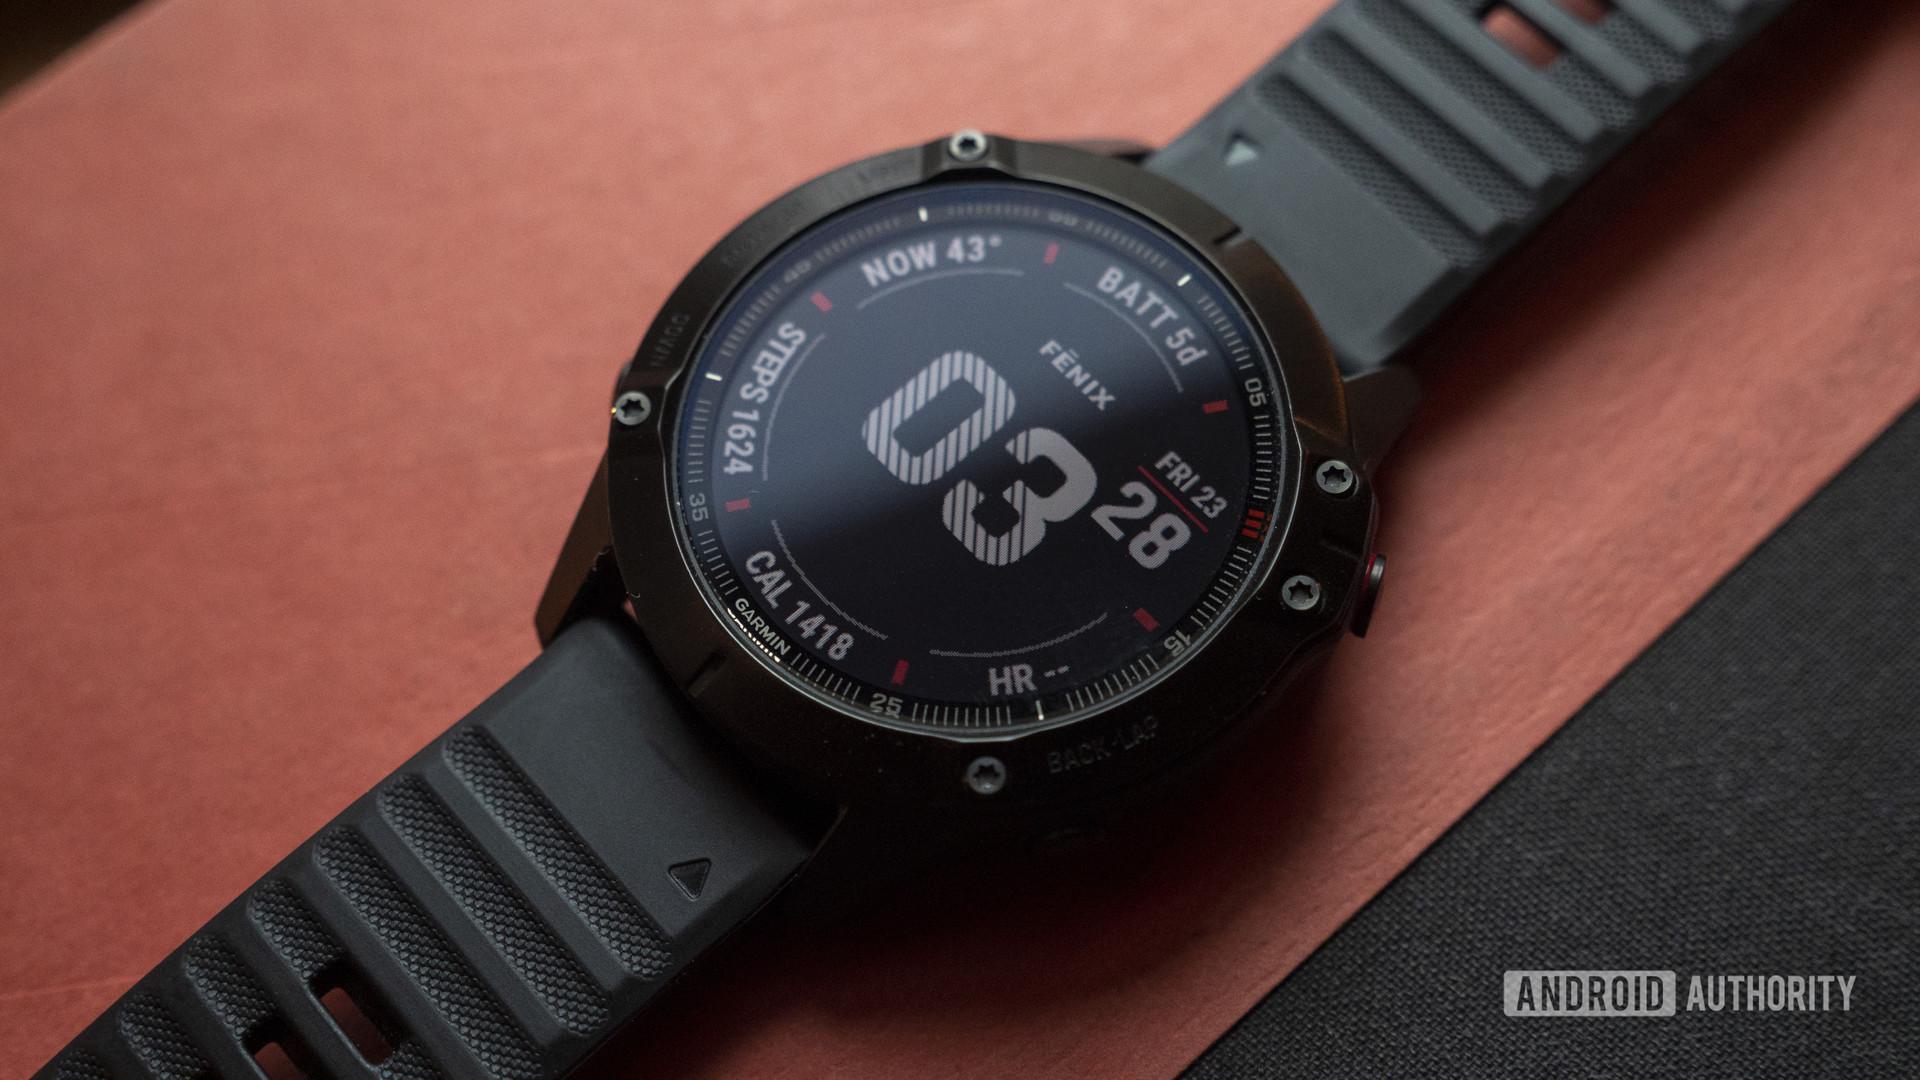 garmin fenix 6 pro display watch face 2